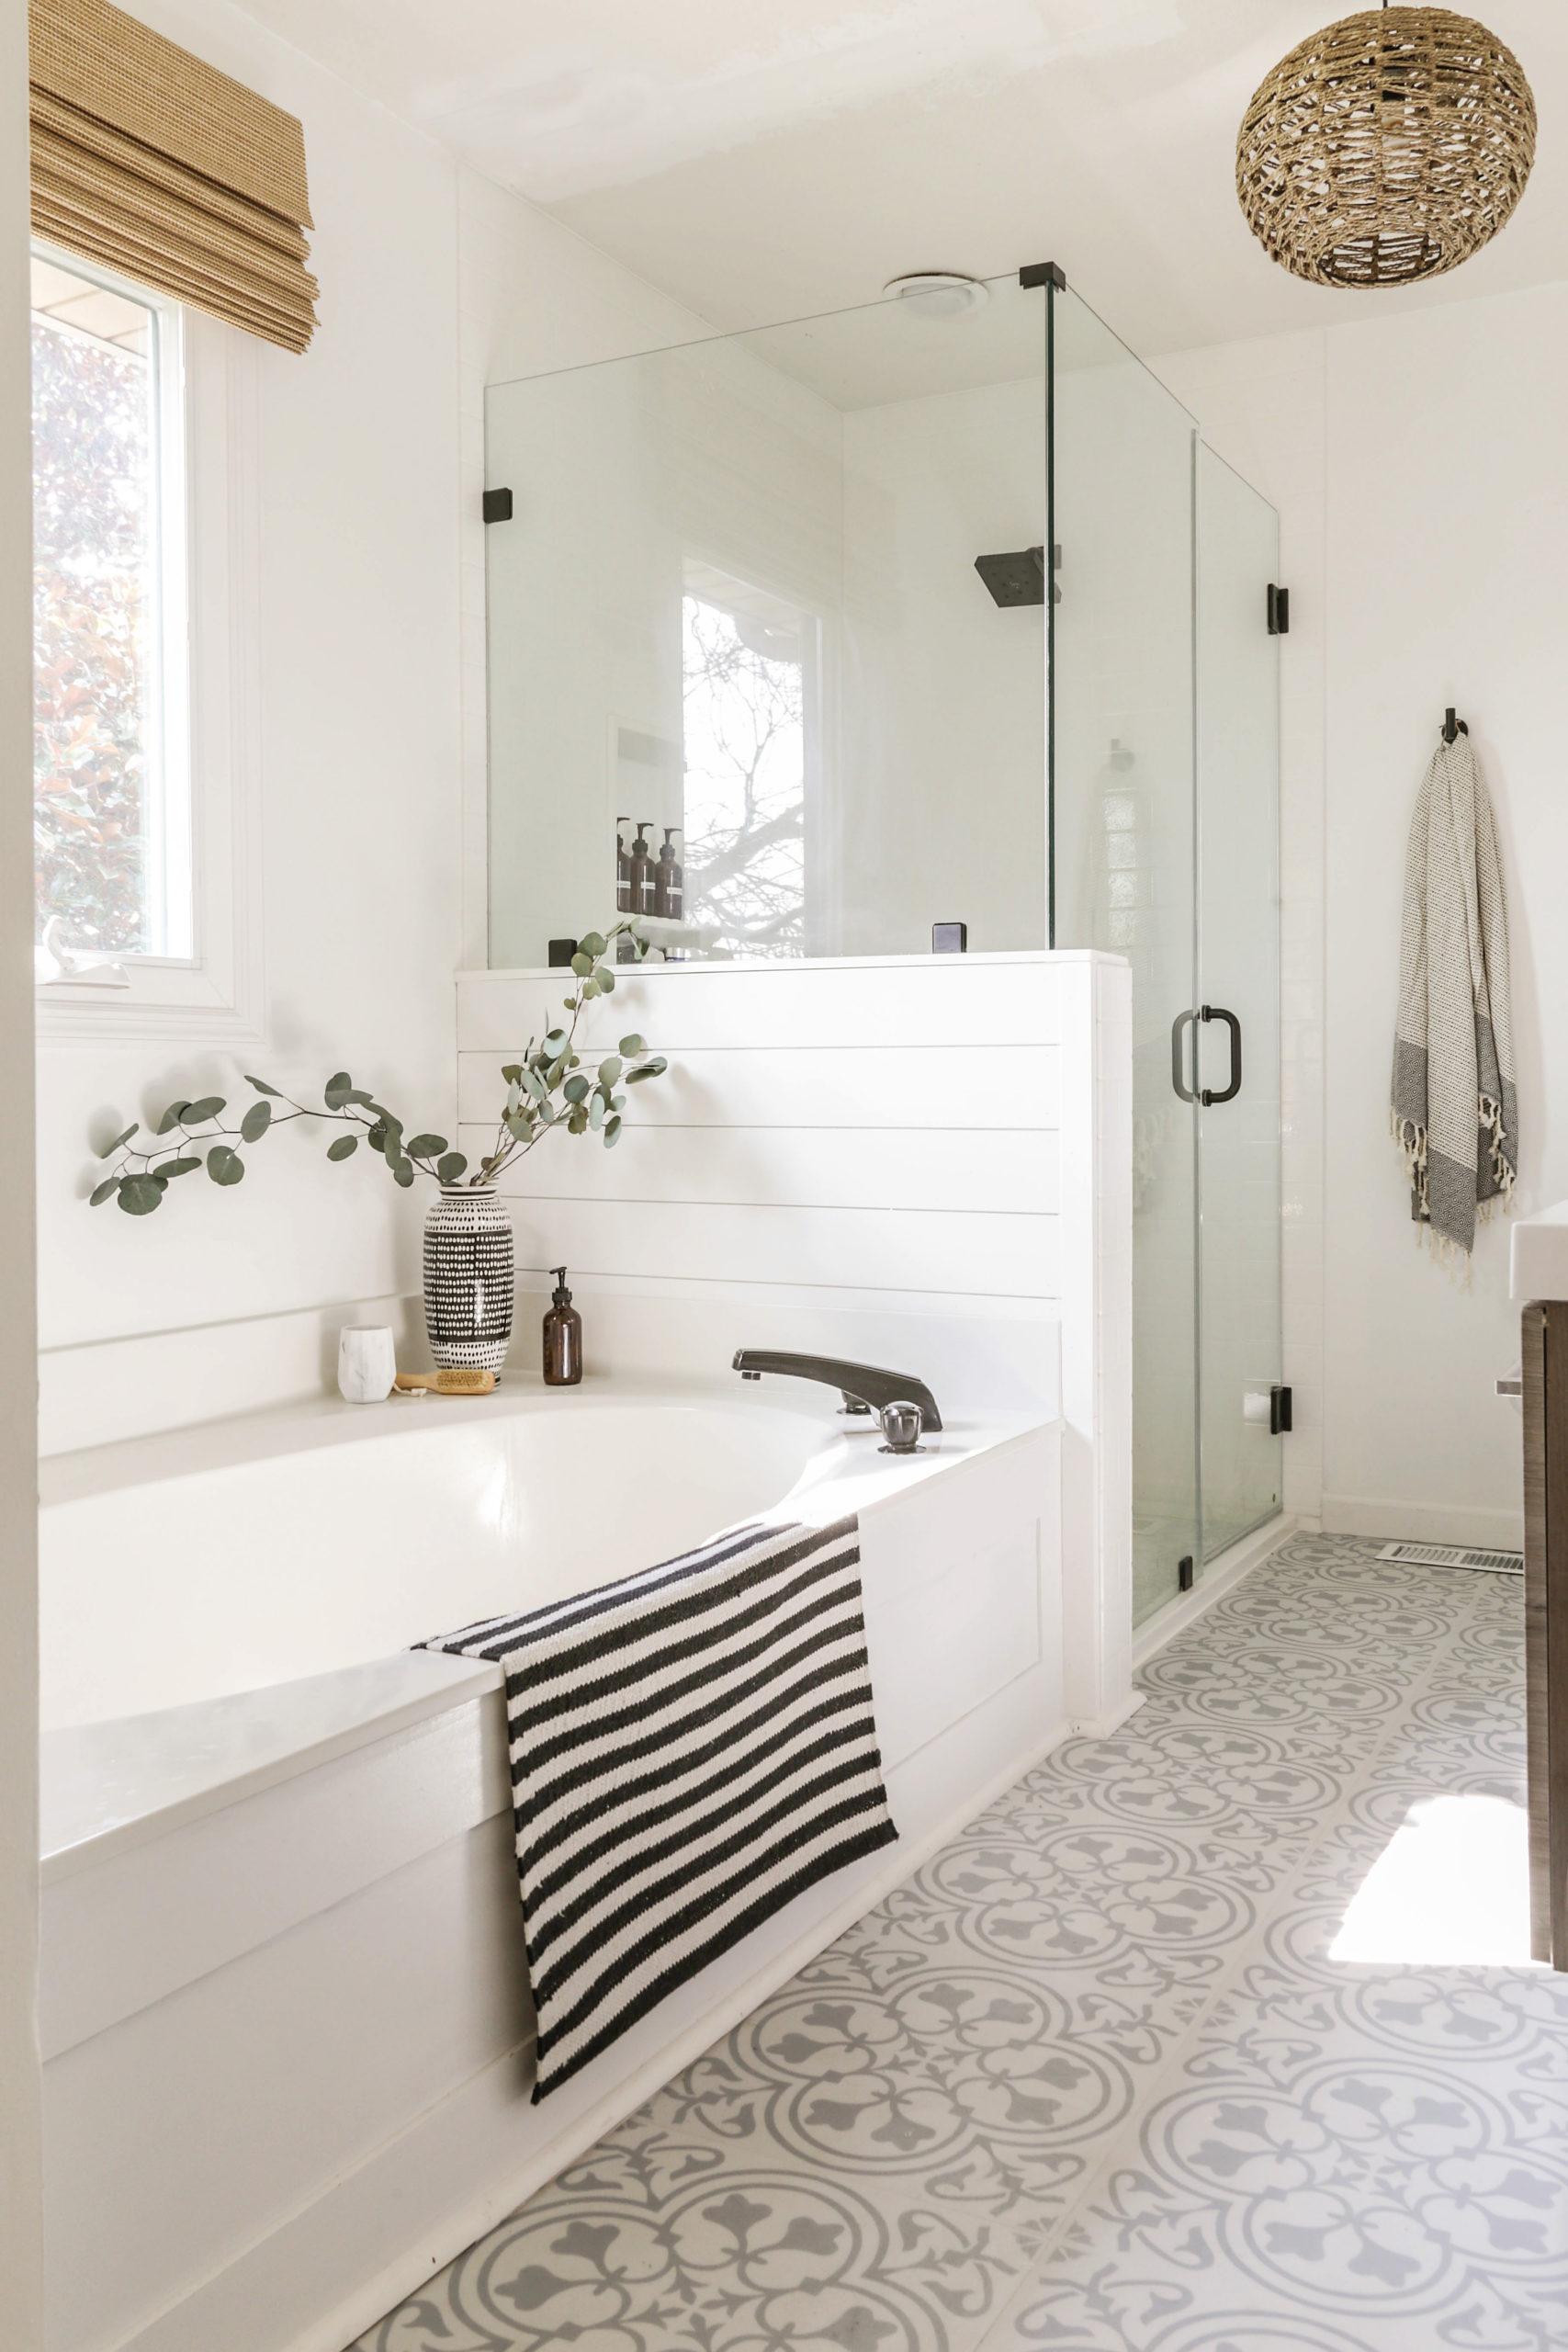 Reveal Boho Farmhouse Master Bathroom Remodel With Decor Sources